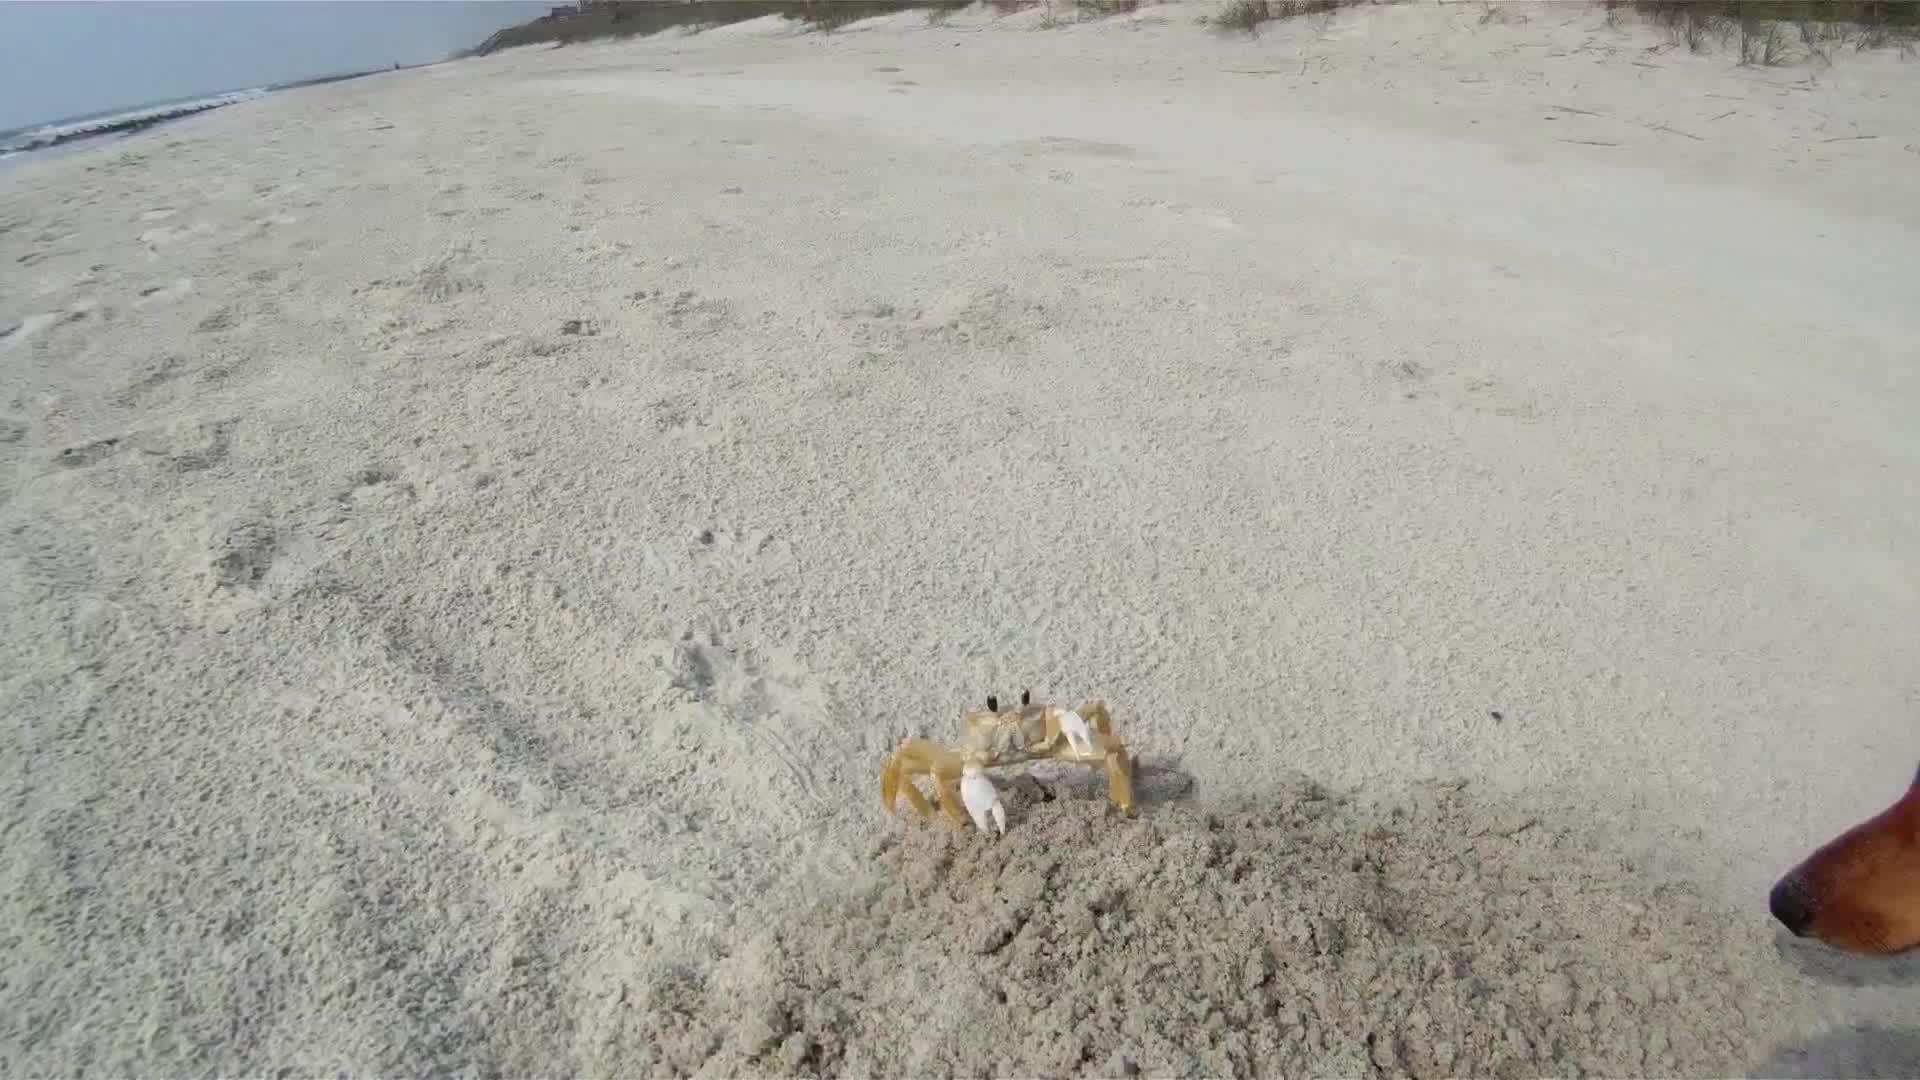 aww, Madeline dachshund puppy with Crab GIFs